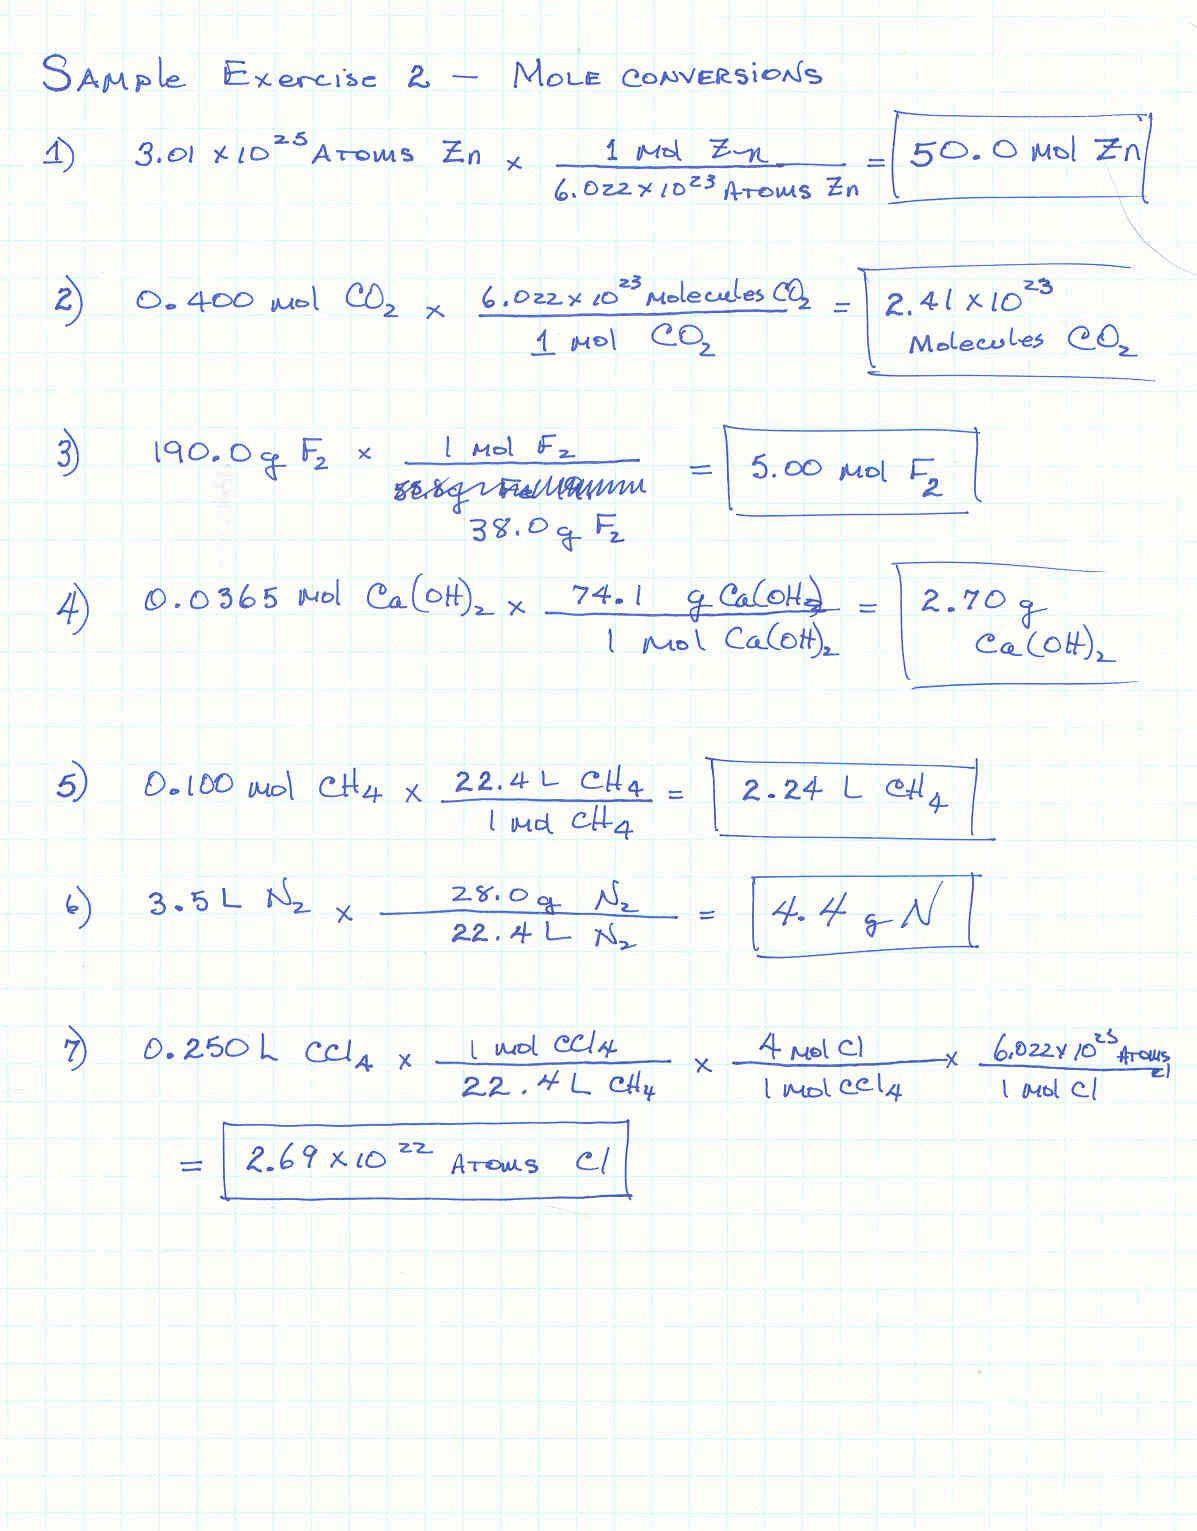 Molar Conversion Worksheet Answers